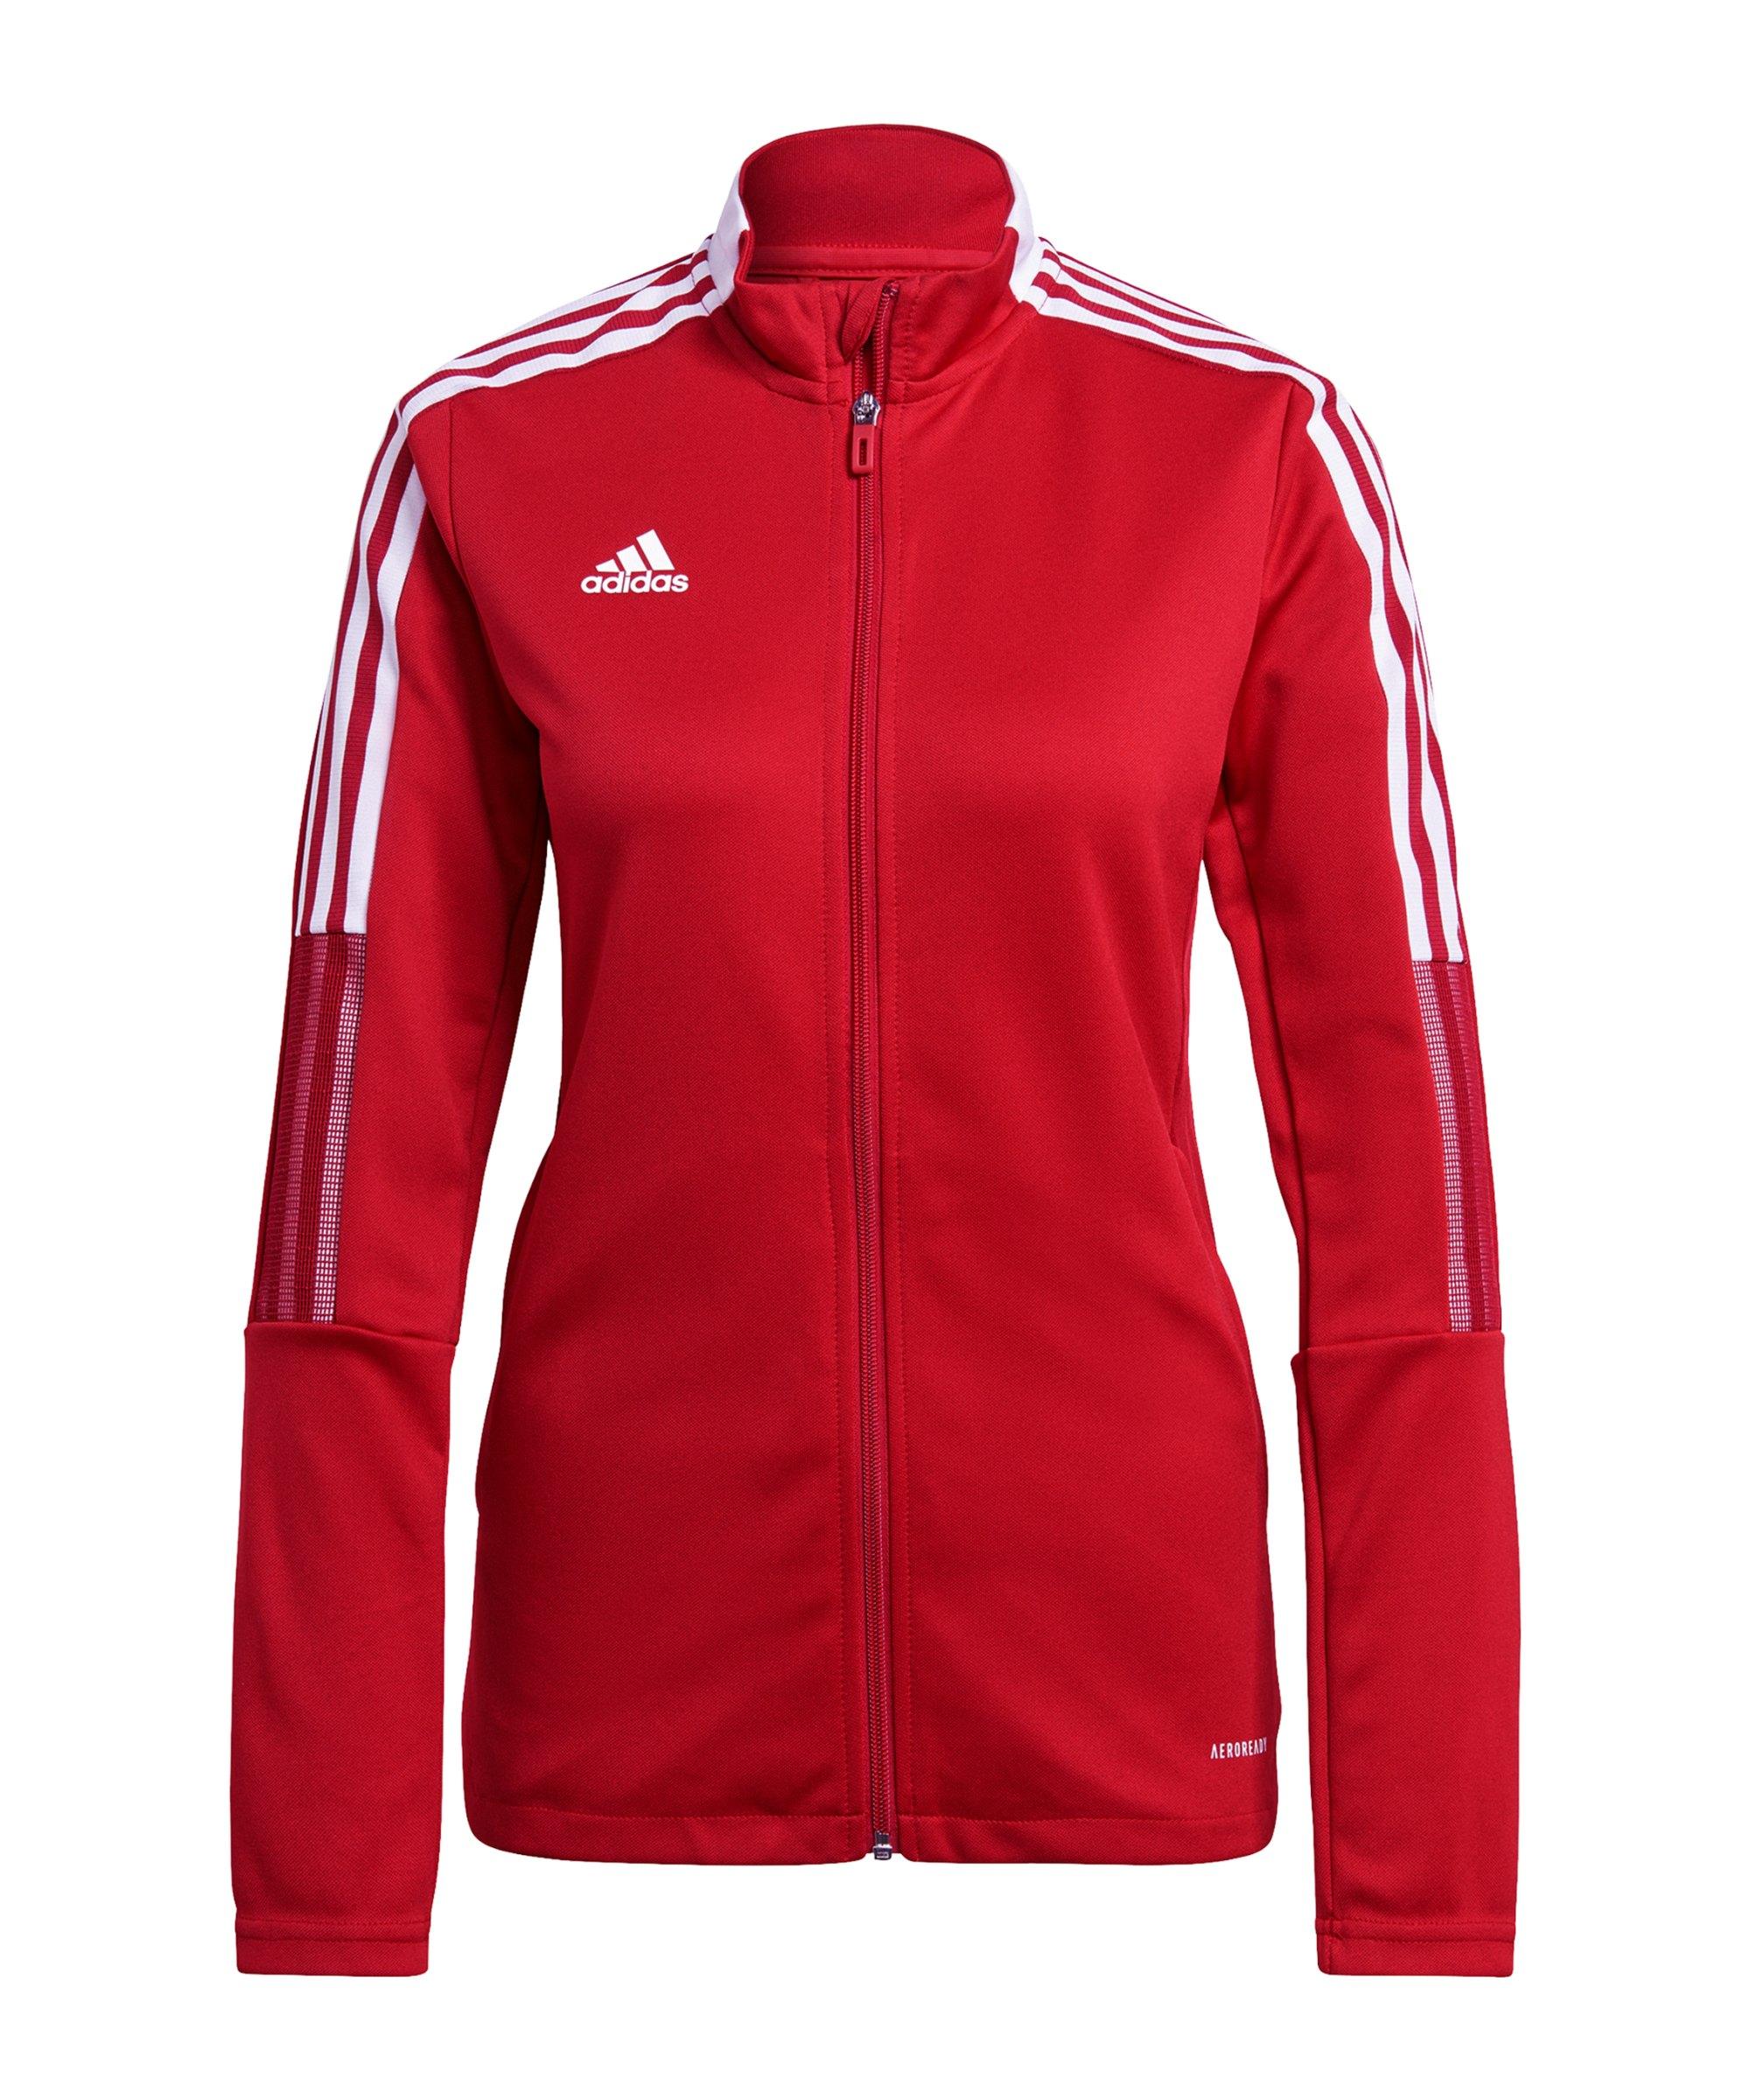 adidas Tiro 21 Trainingsjacke Damen Rot - rot